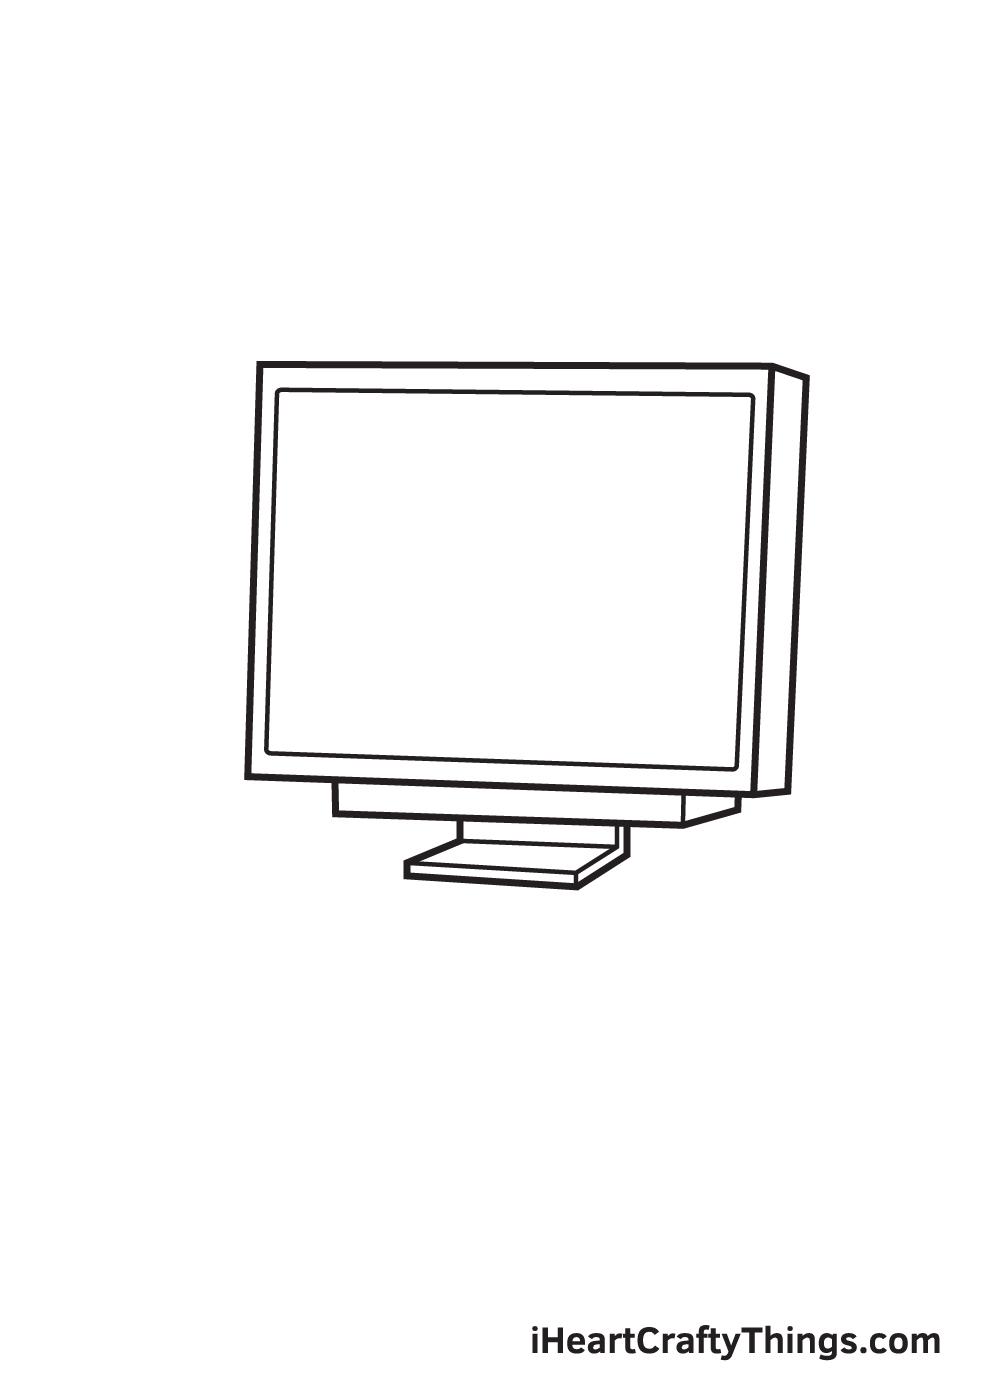 computer drawing - step 4